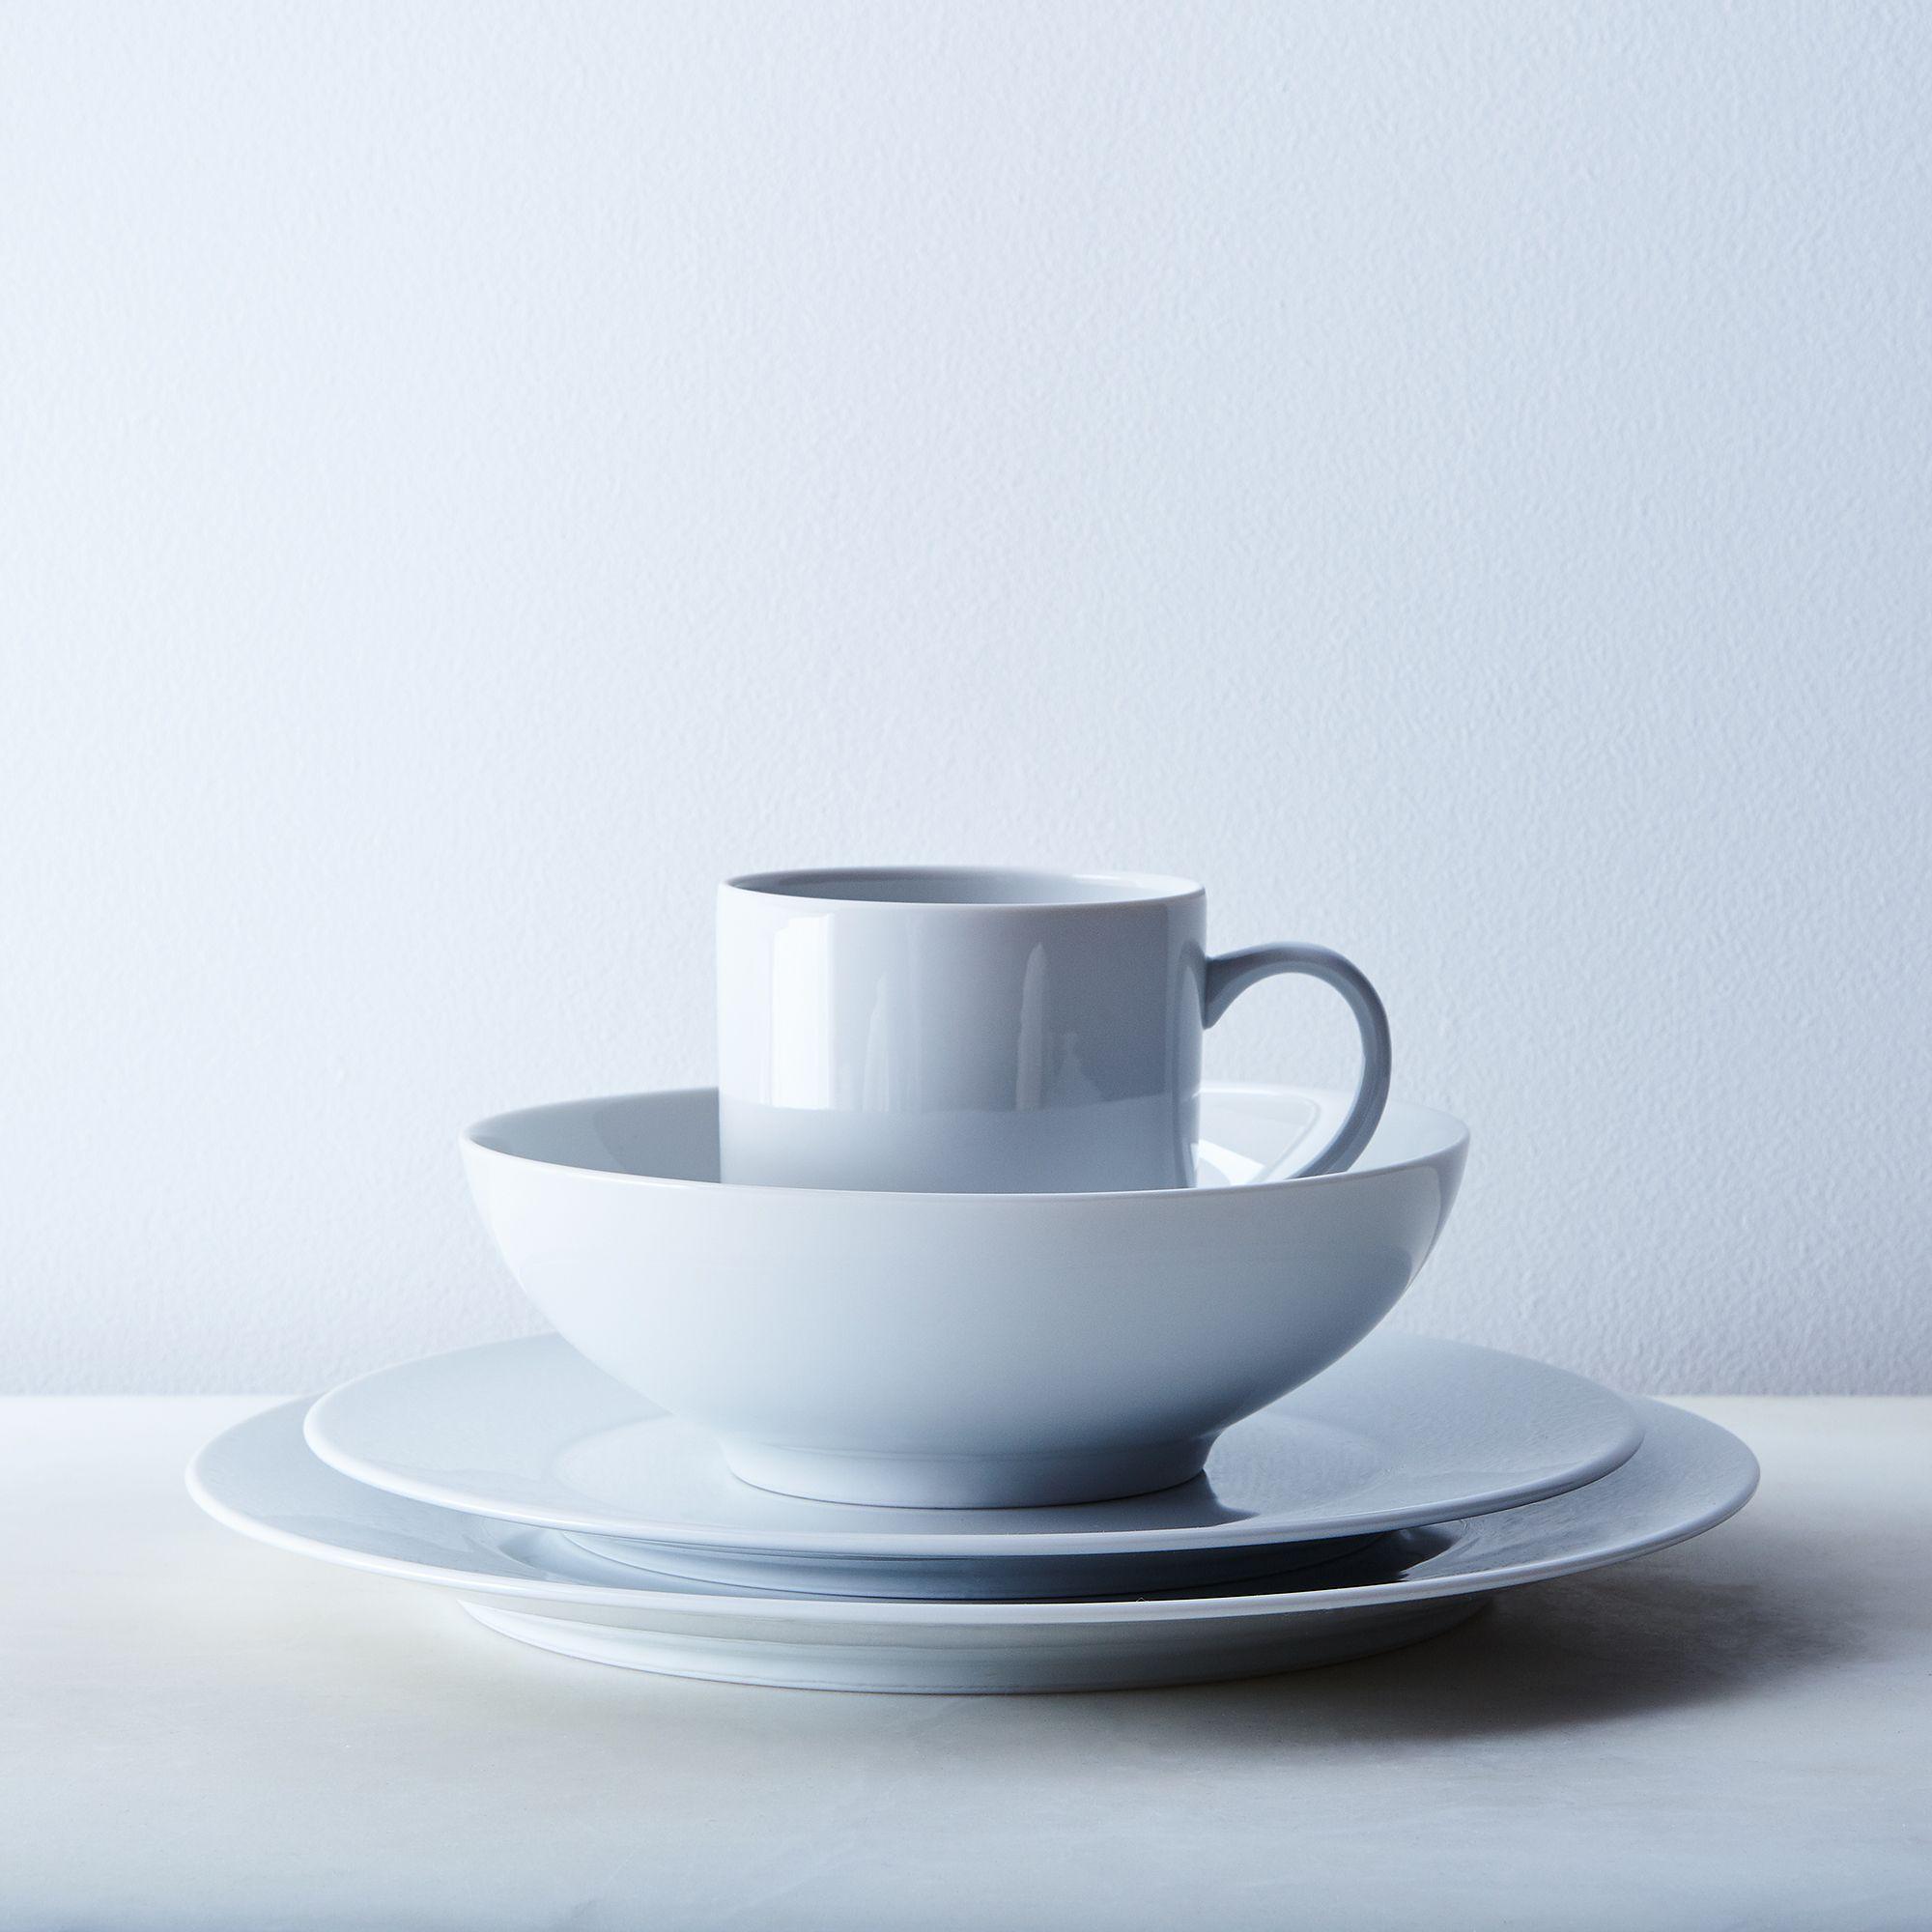 White Porcelain Dinnerware 16-piece Set